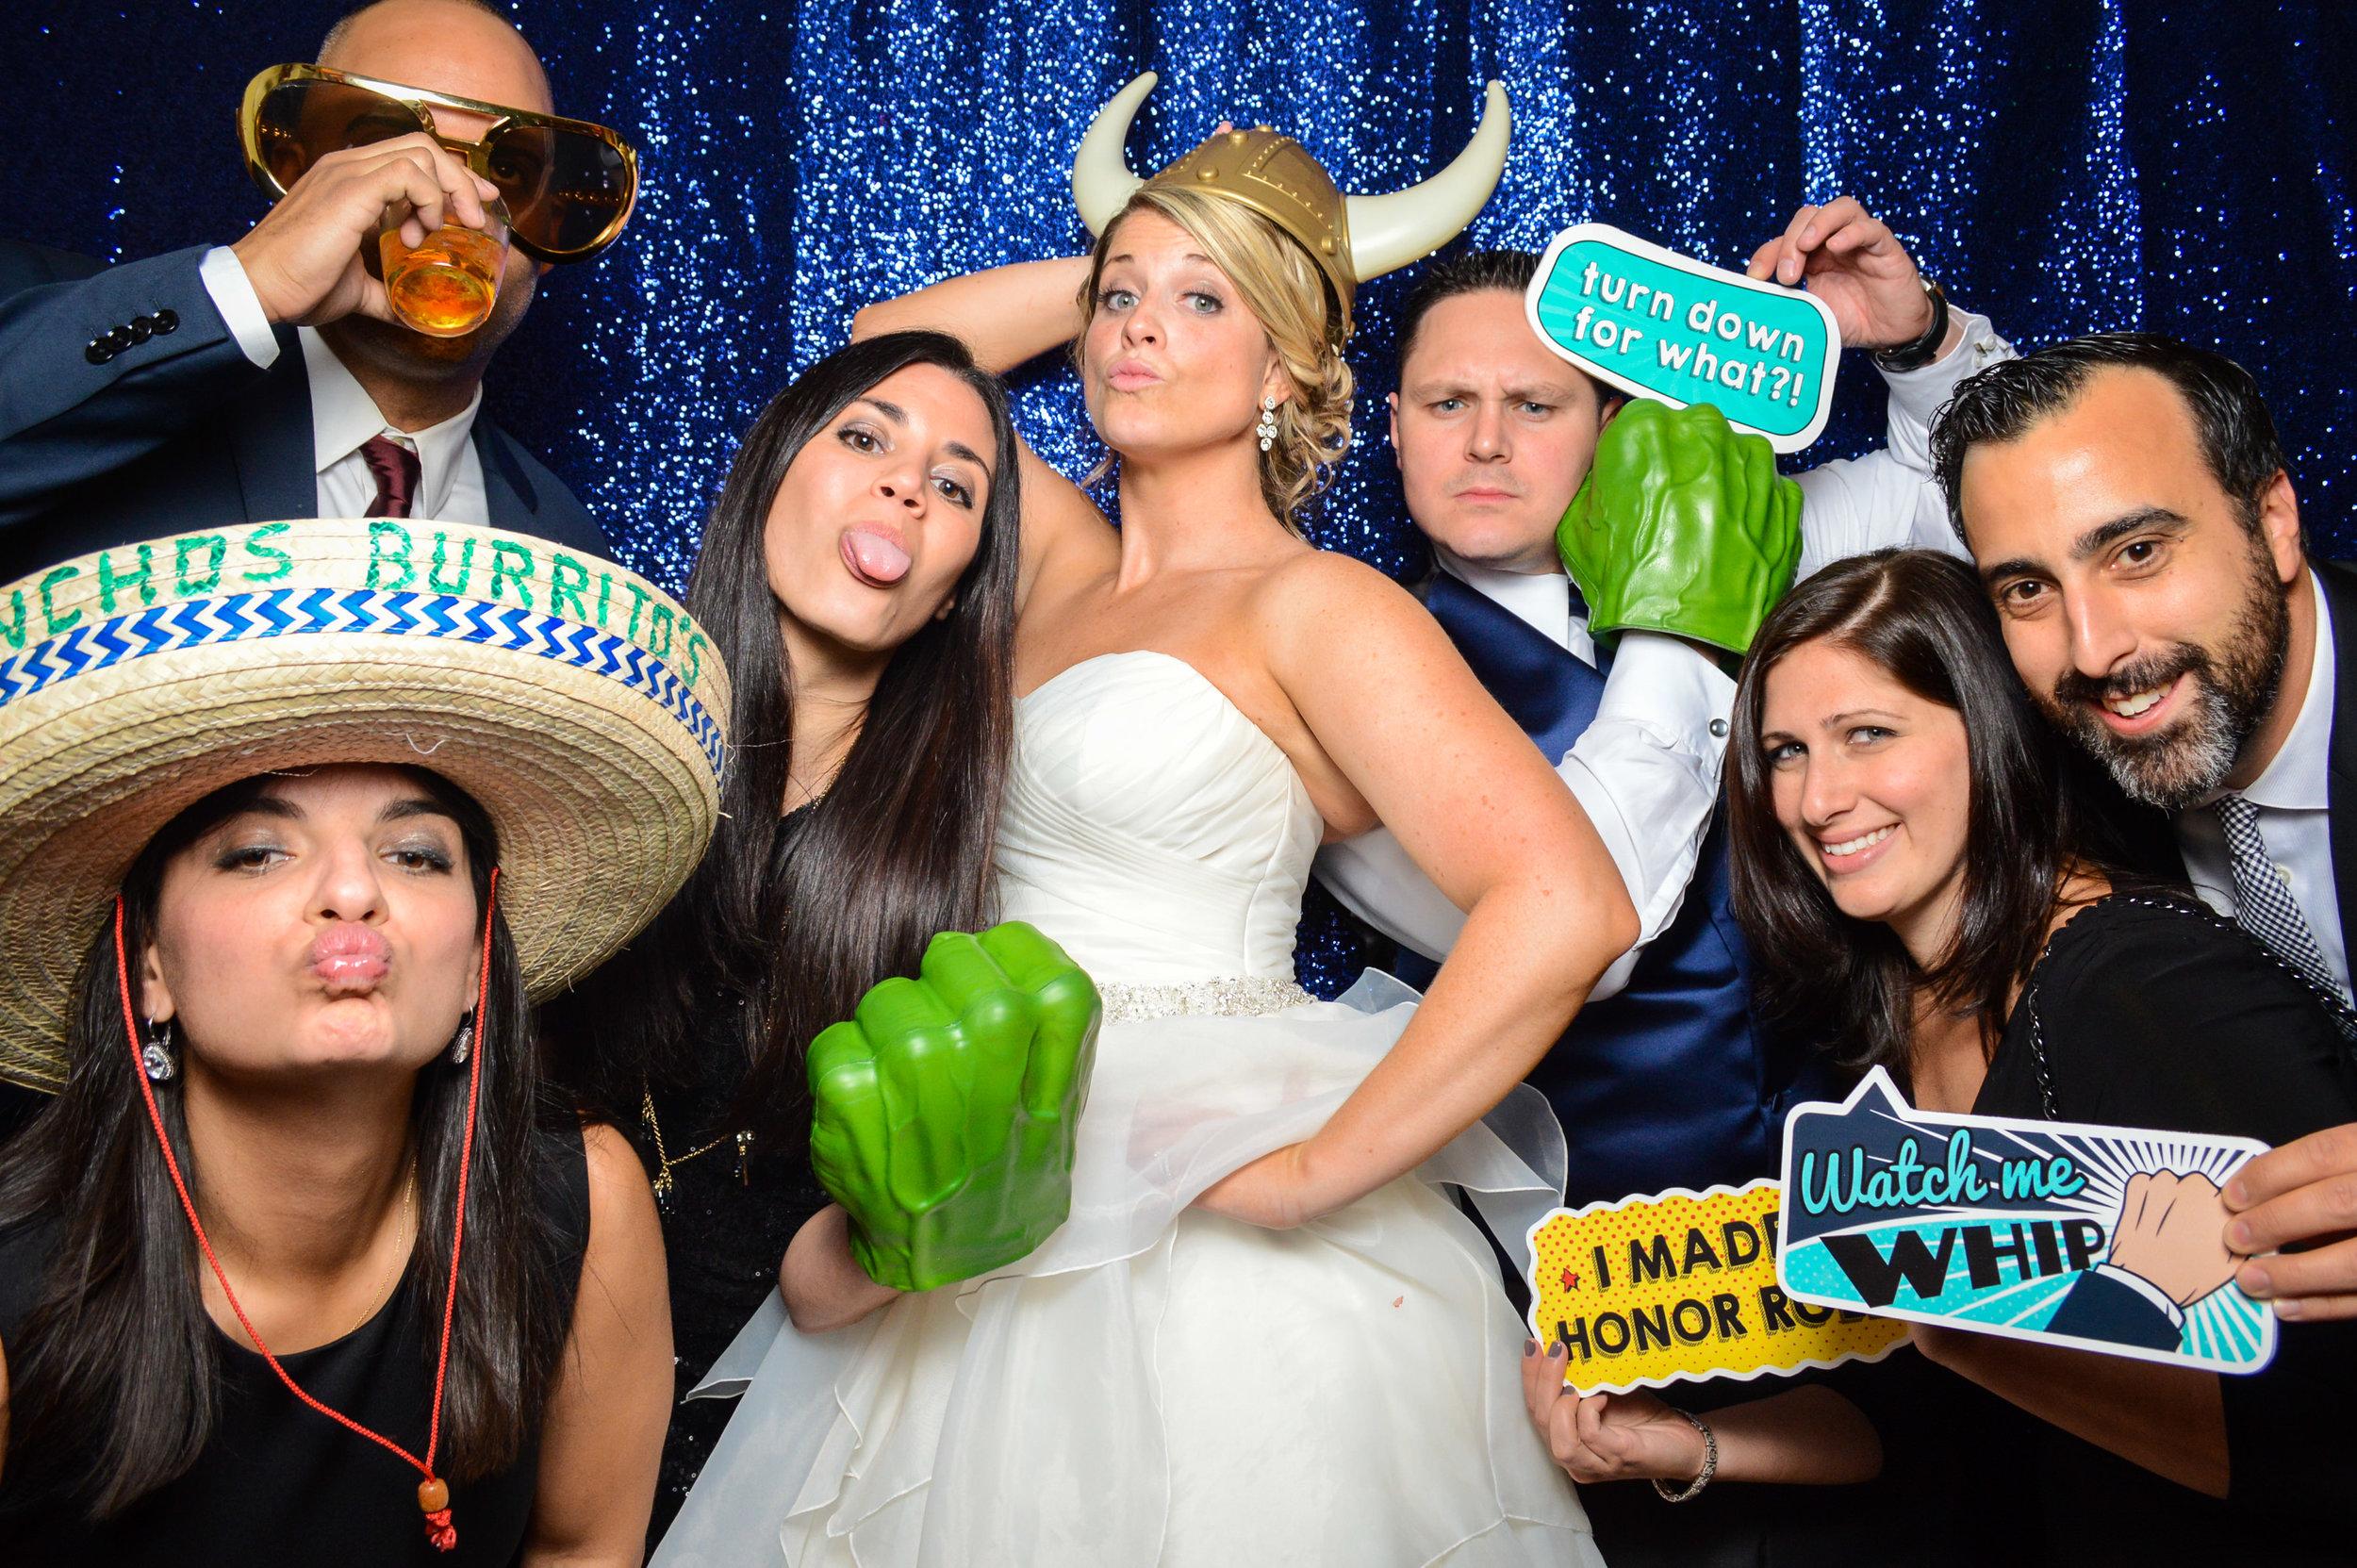 Best Wedding Photobooths in NJ